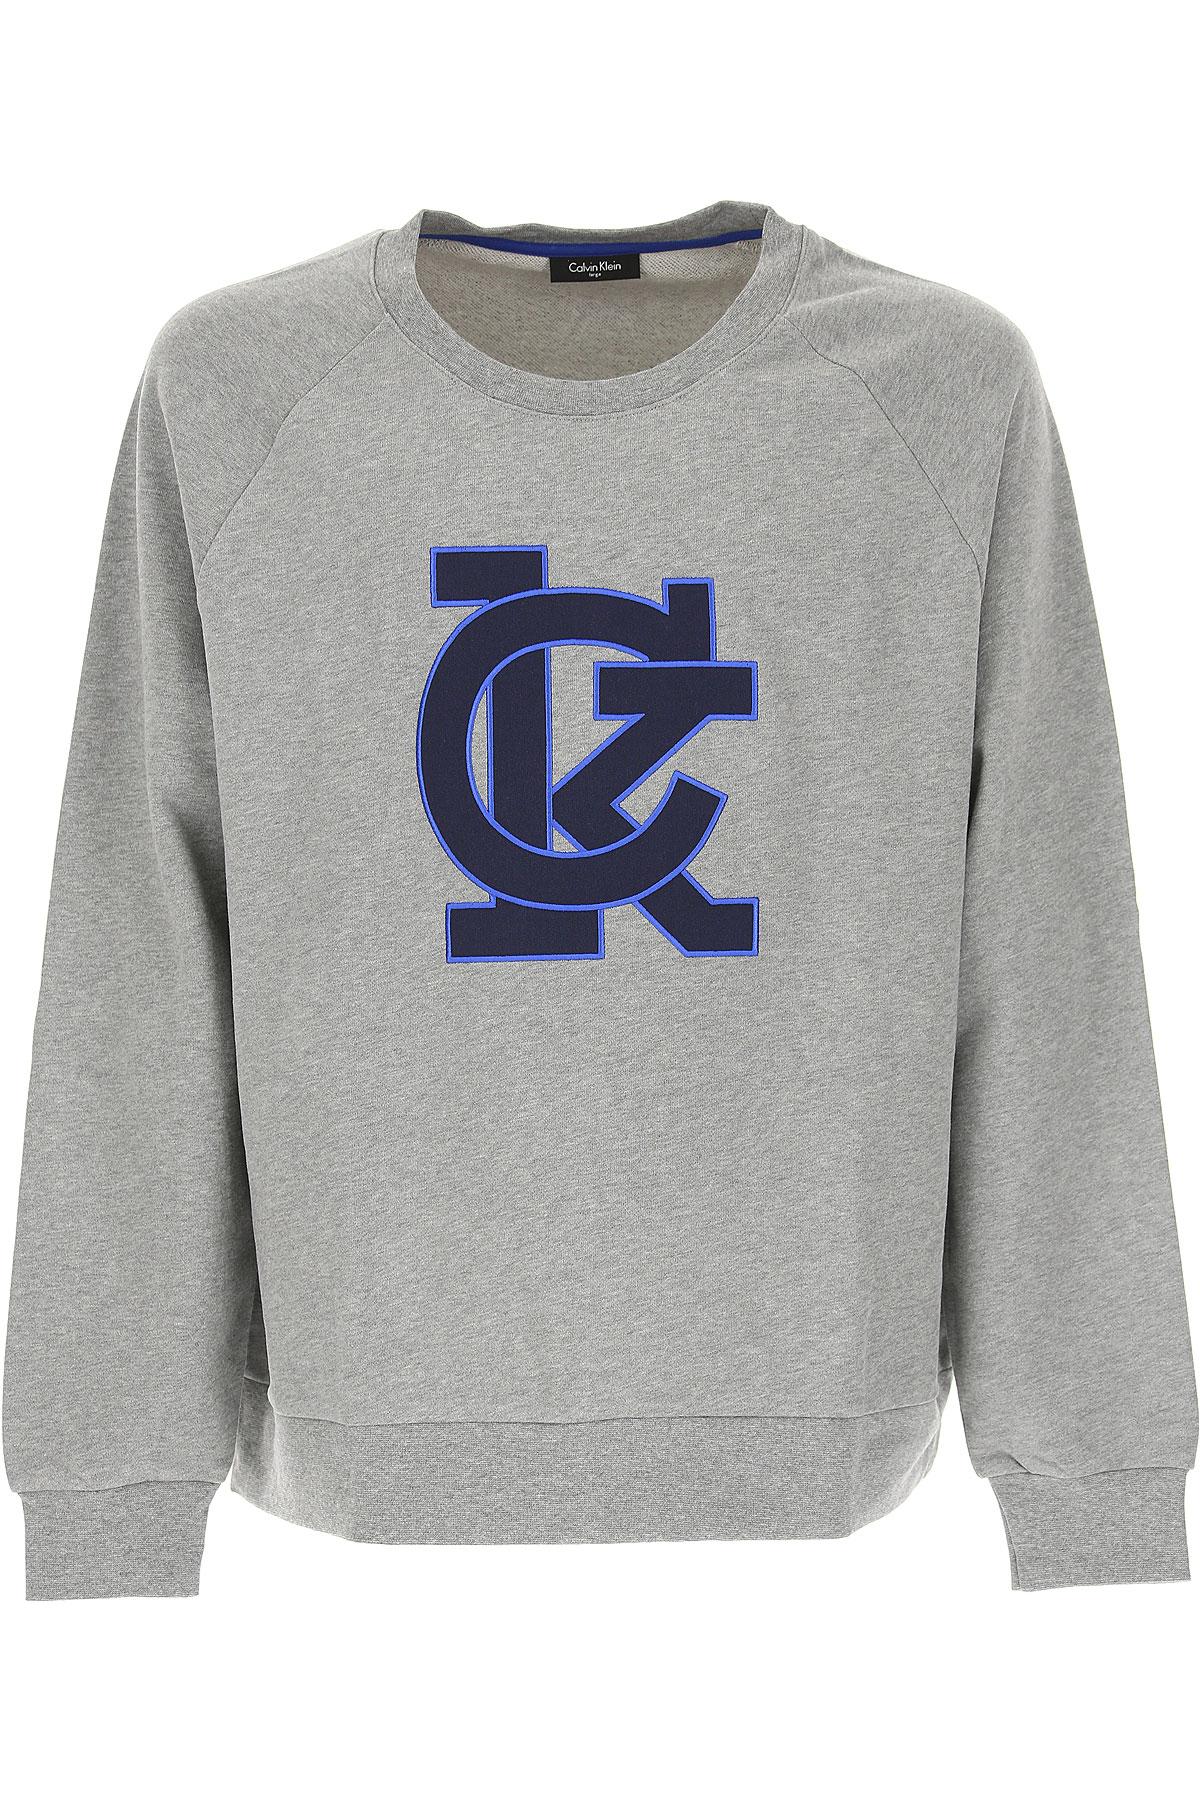 Calvin Klein Sweatshirt for Men, Grey, Cotton, 2017, L M S XL USA-467673